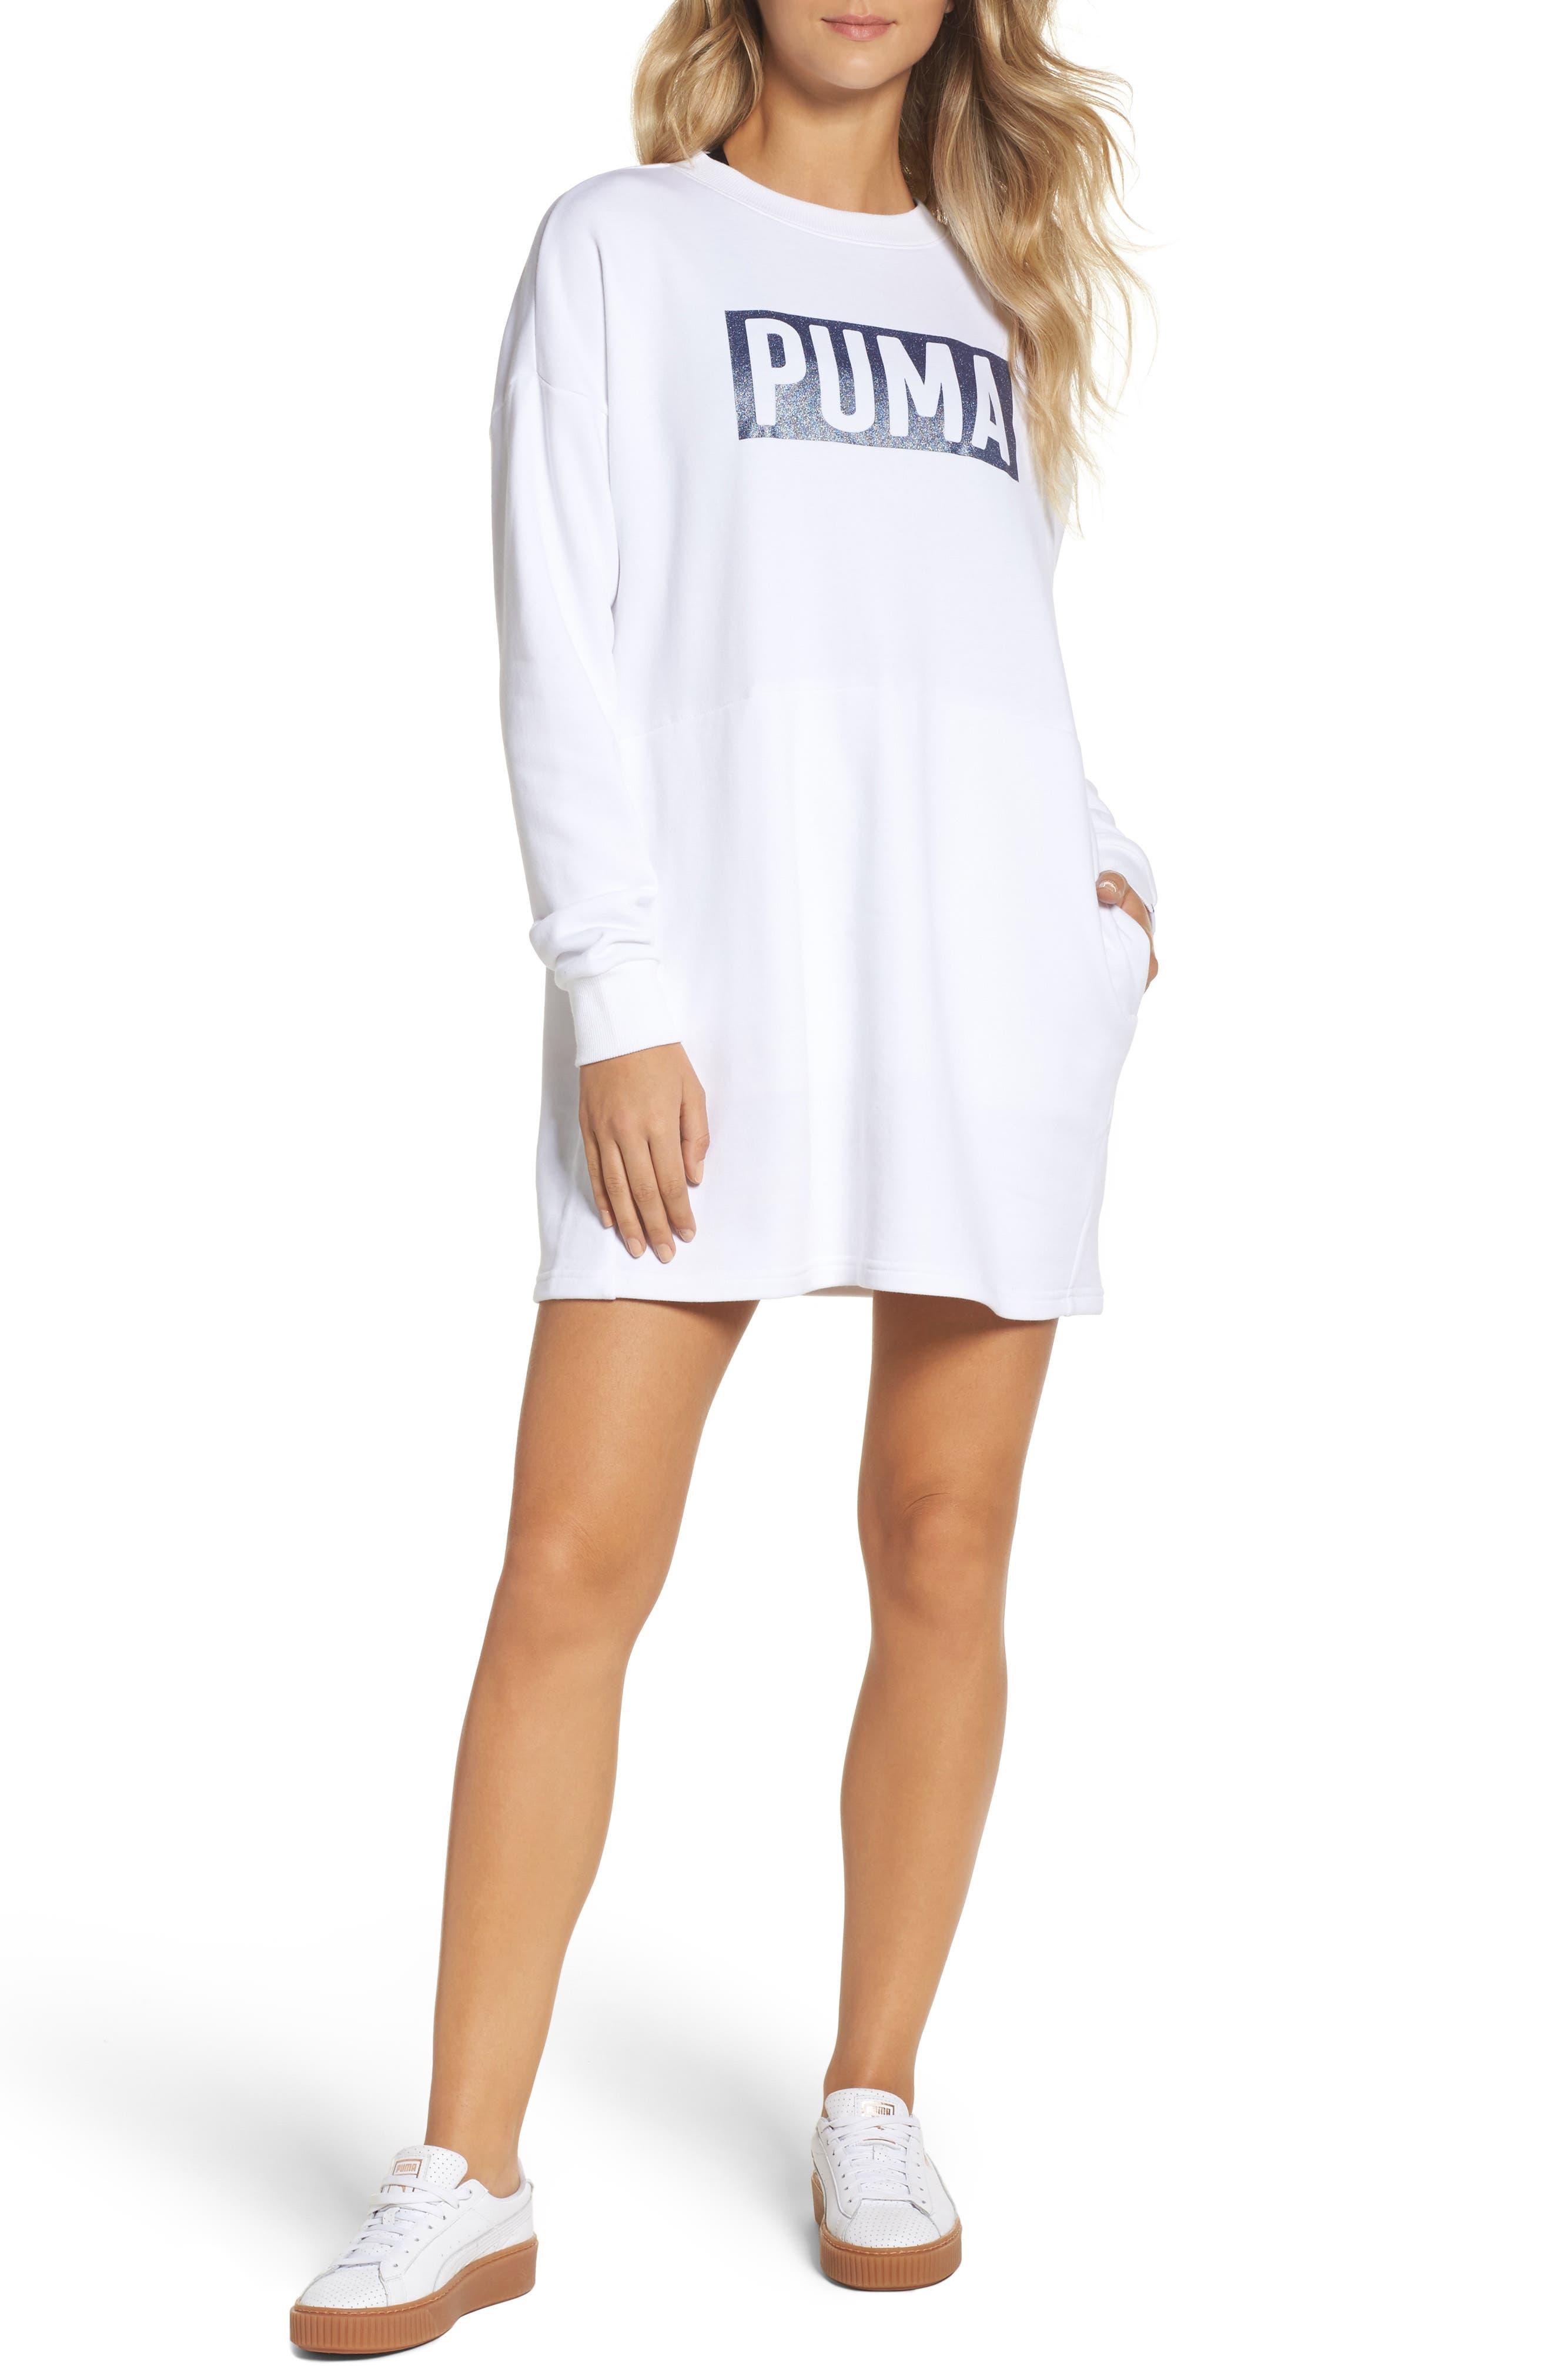 Main Image - PUMA Fusion Sweatshirt Dress